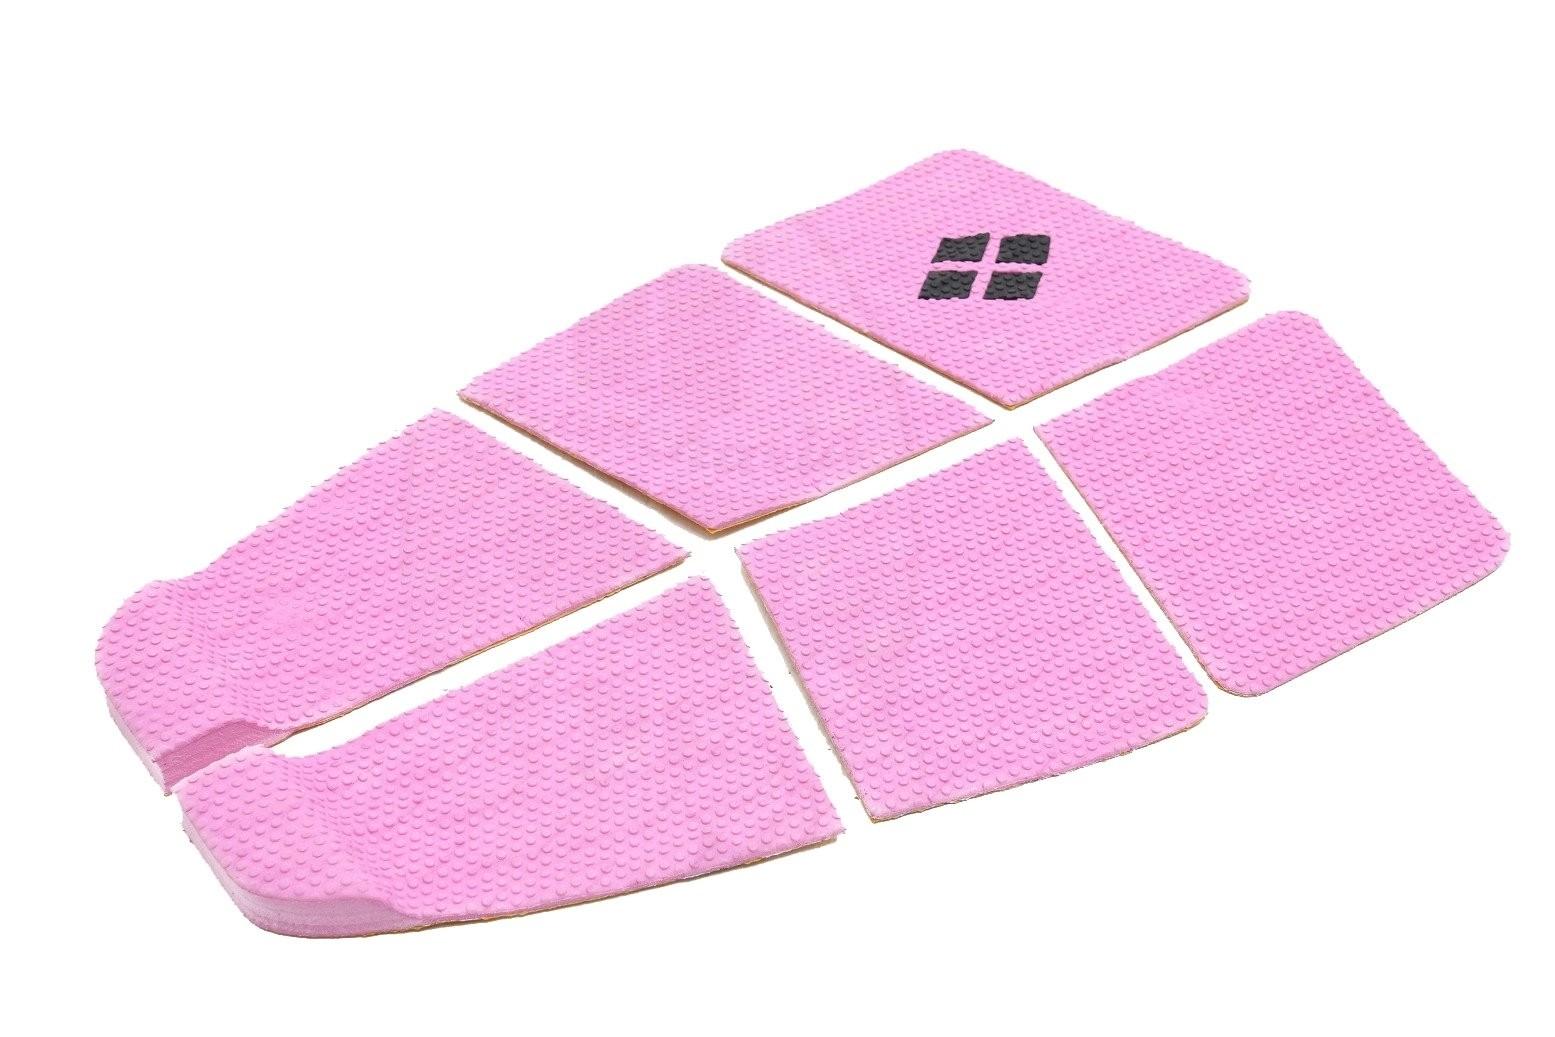 Deck Surf 6 Partes Rubber Sticky Rosa | Prancharia